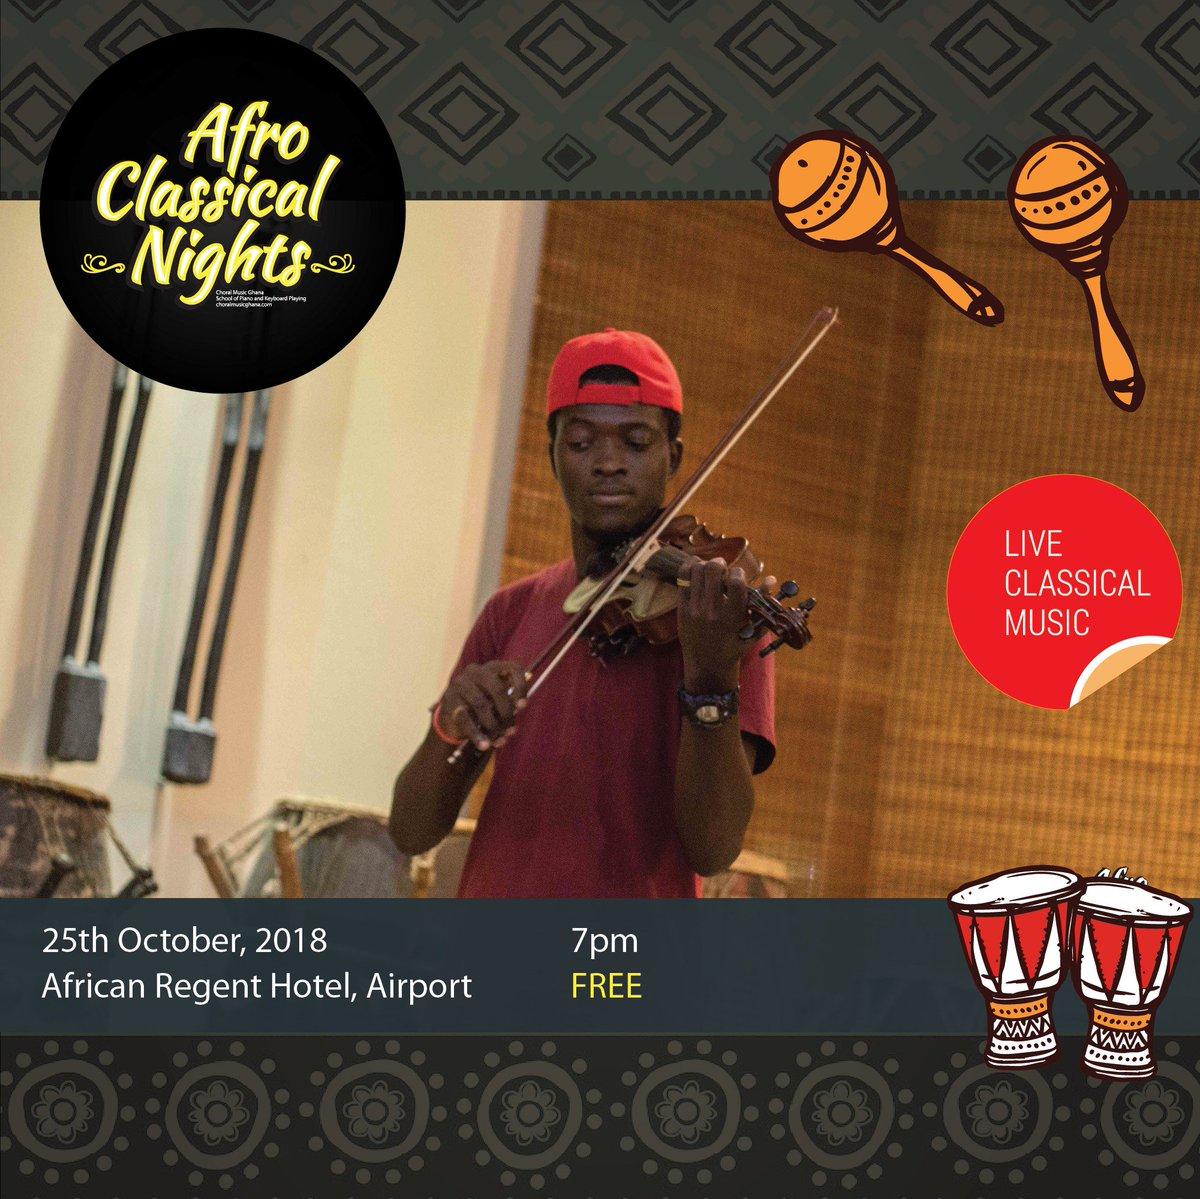 Choral Music Ghana on Twitter: